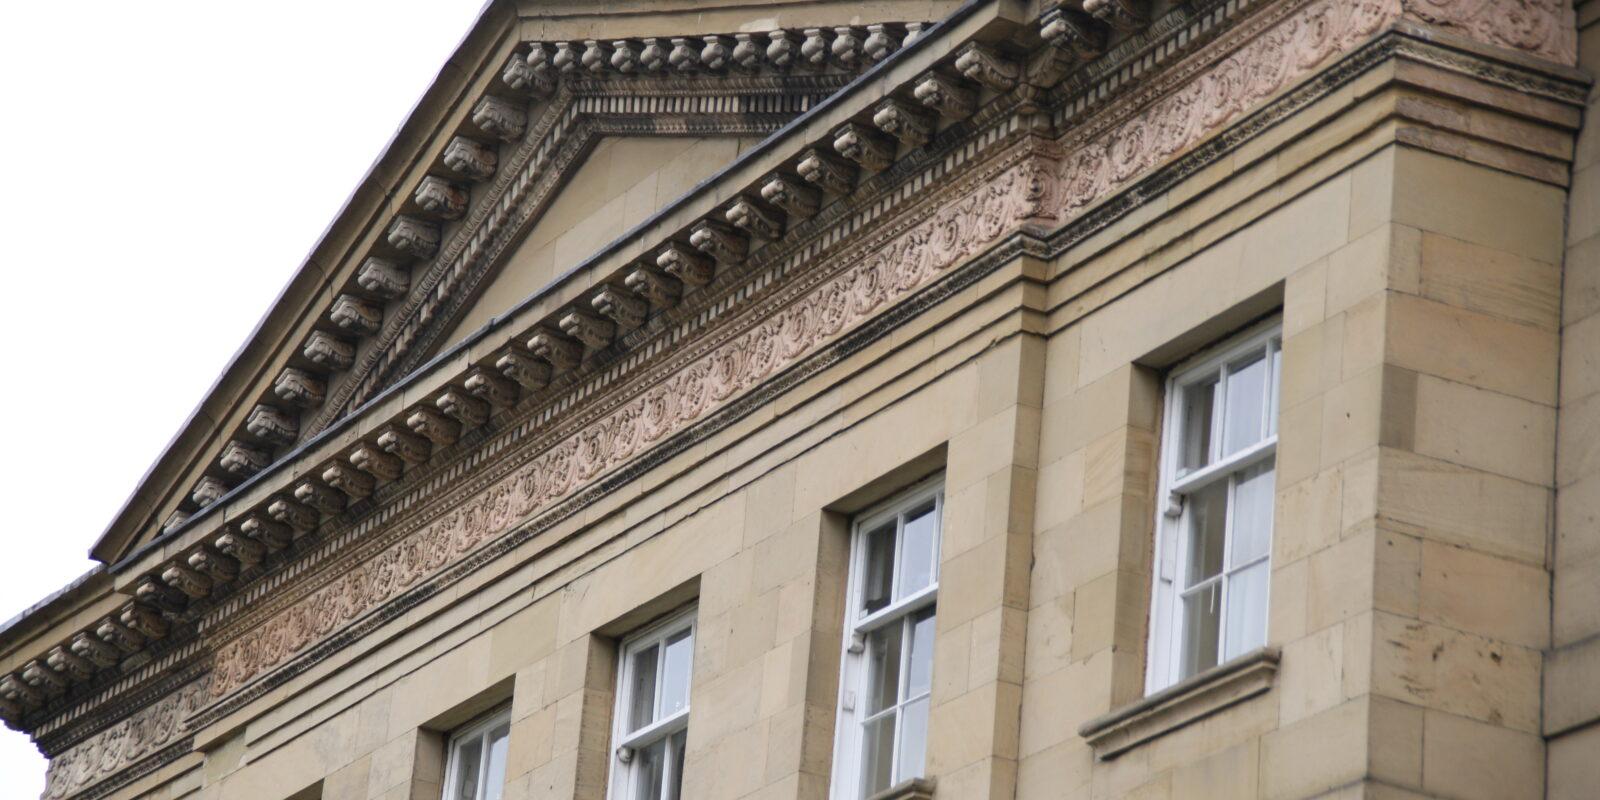 External Fabric Repairs, Leazes Terrace